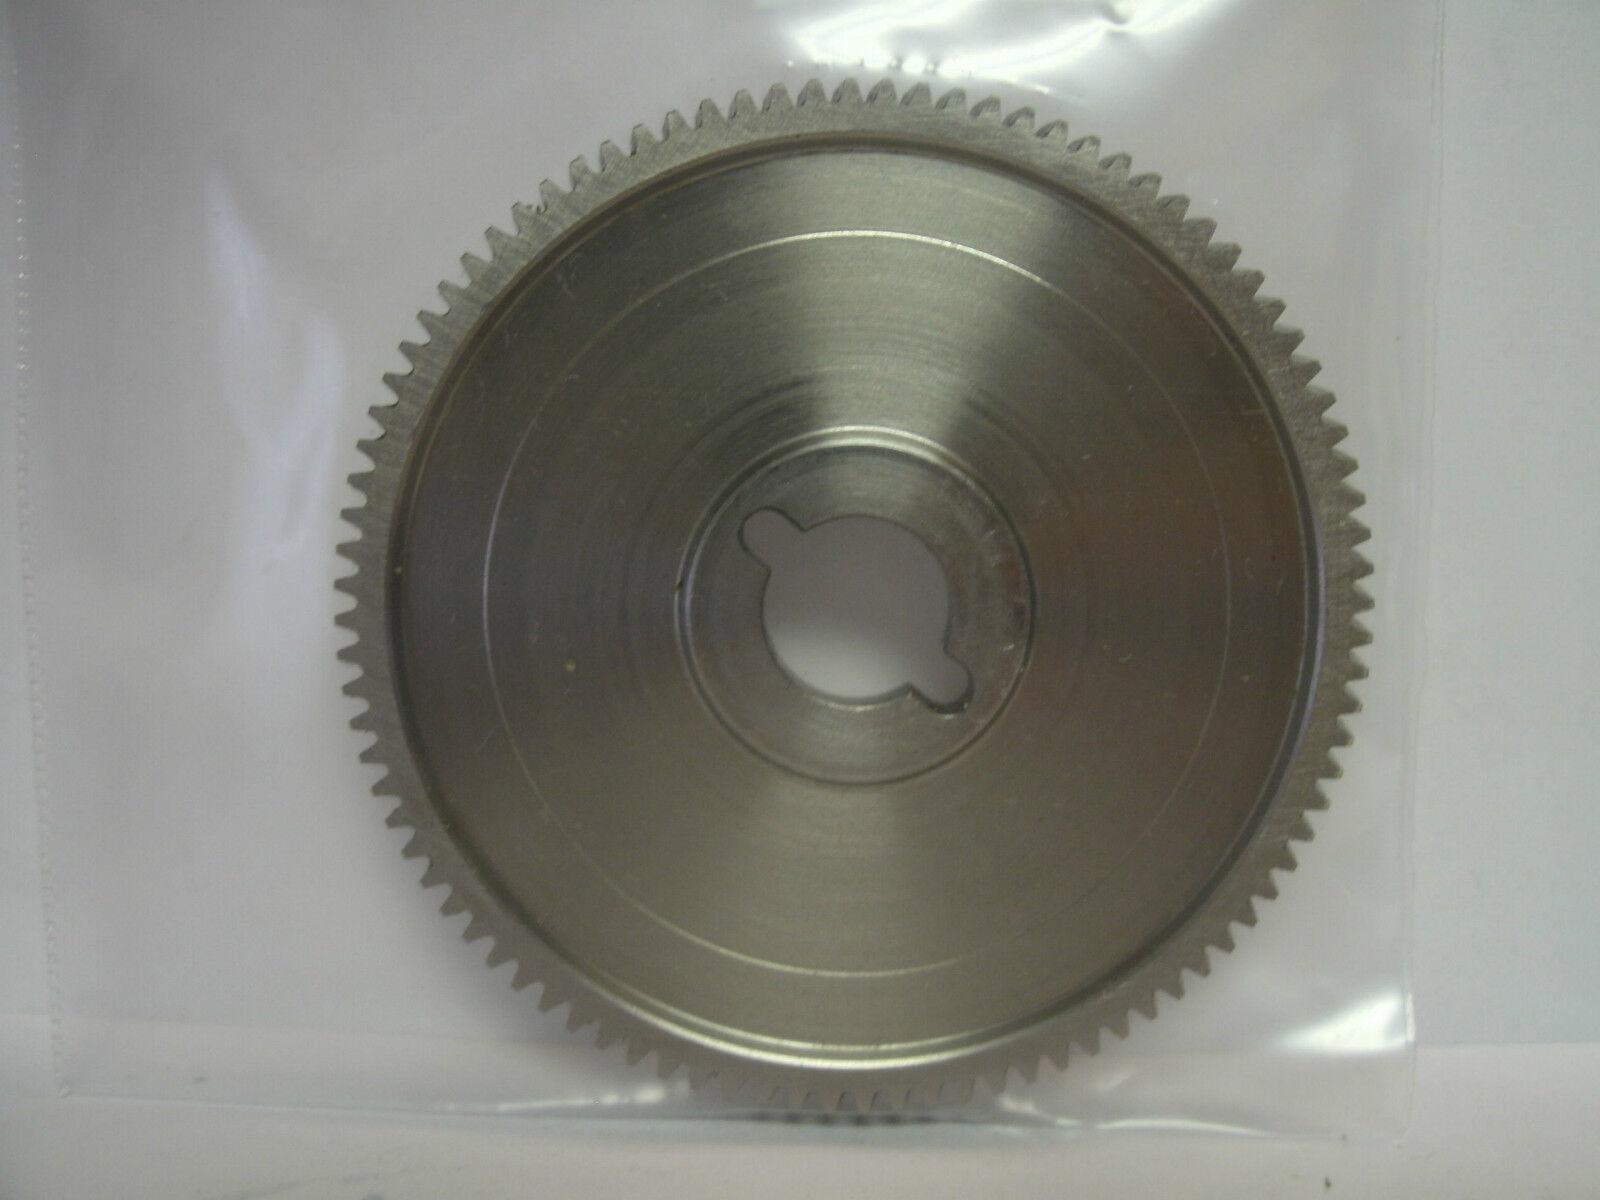 USED DAIWA REEL PART  Saltiga LD 50 HS Conventional  Drive Gear